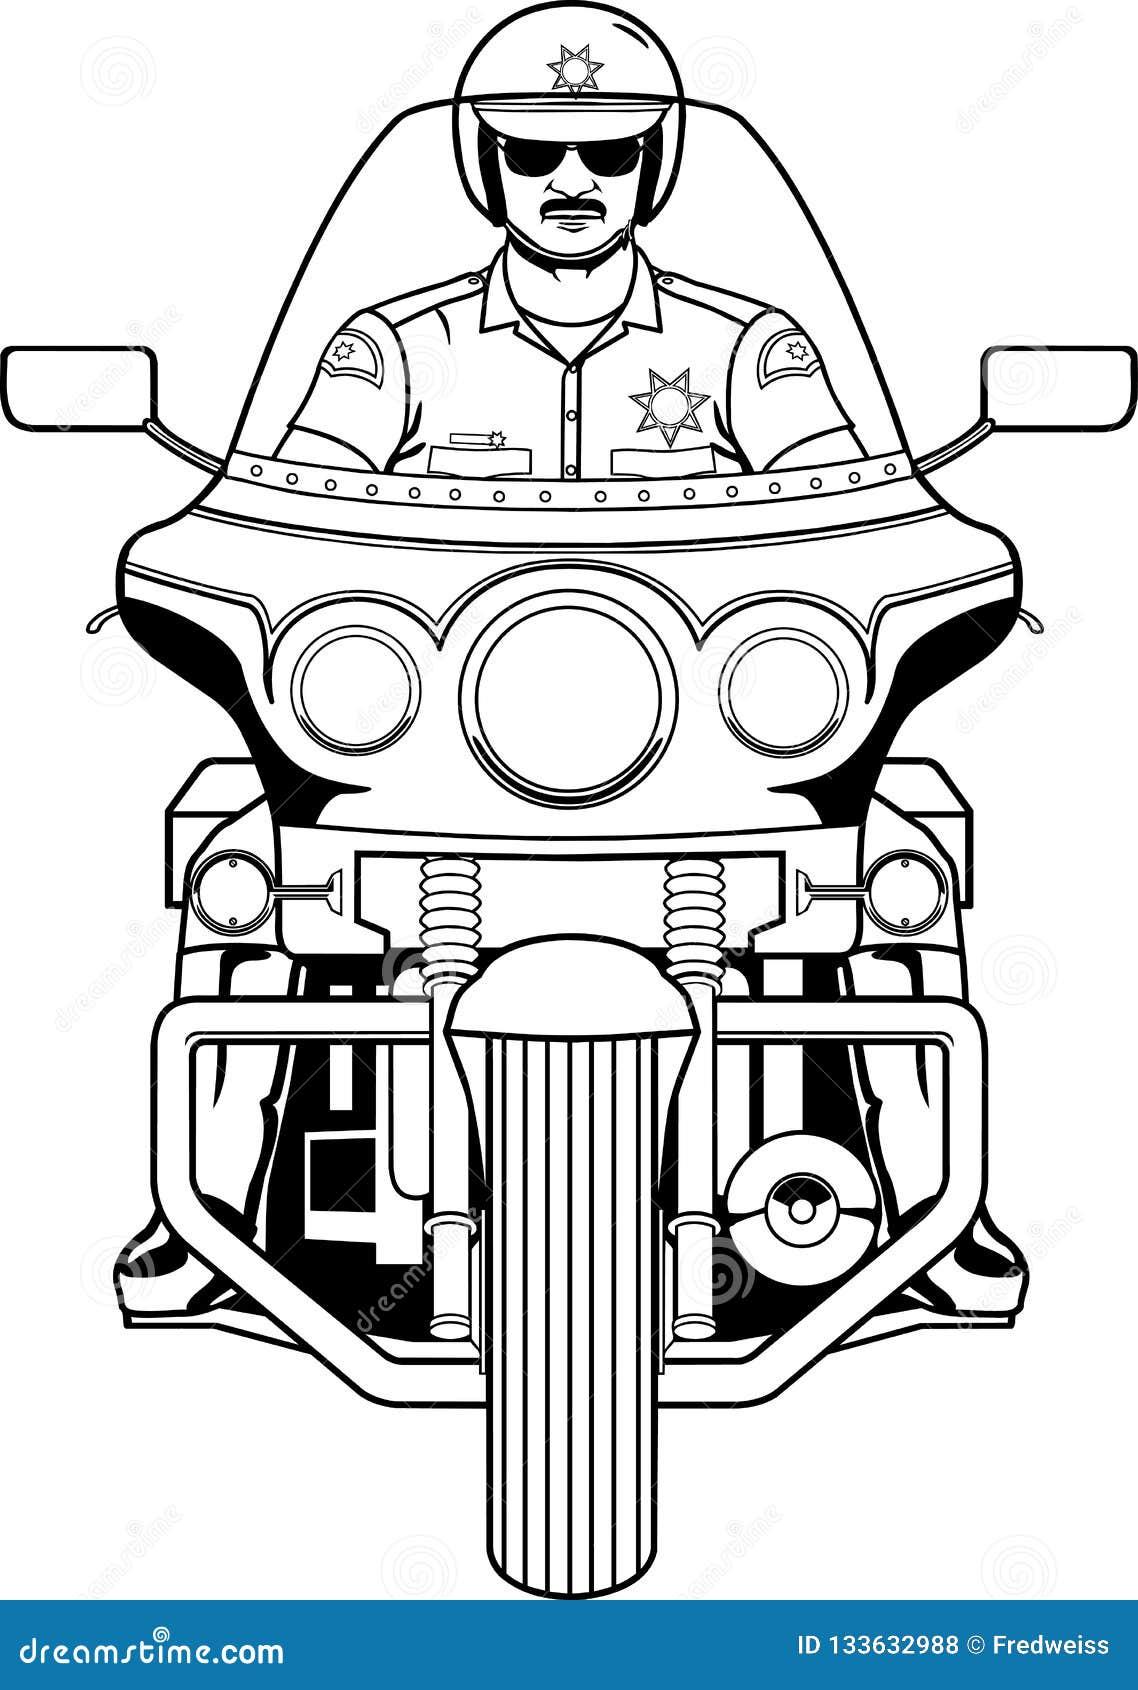 Ejemplo del poli de motocicleta